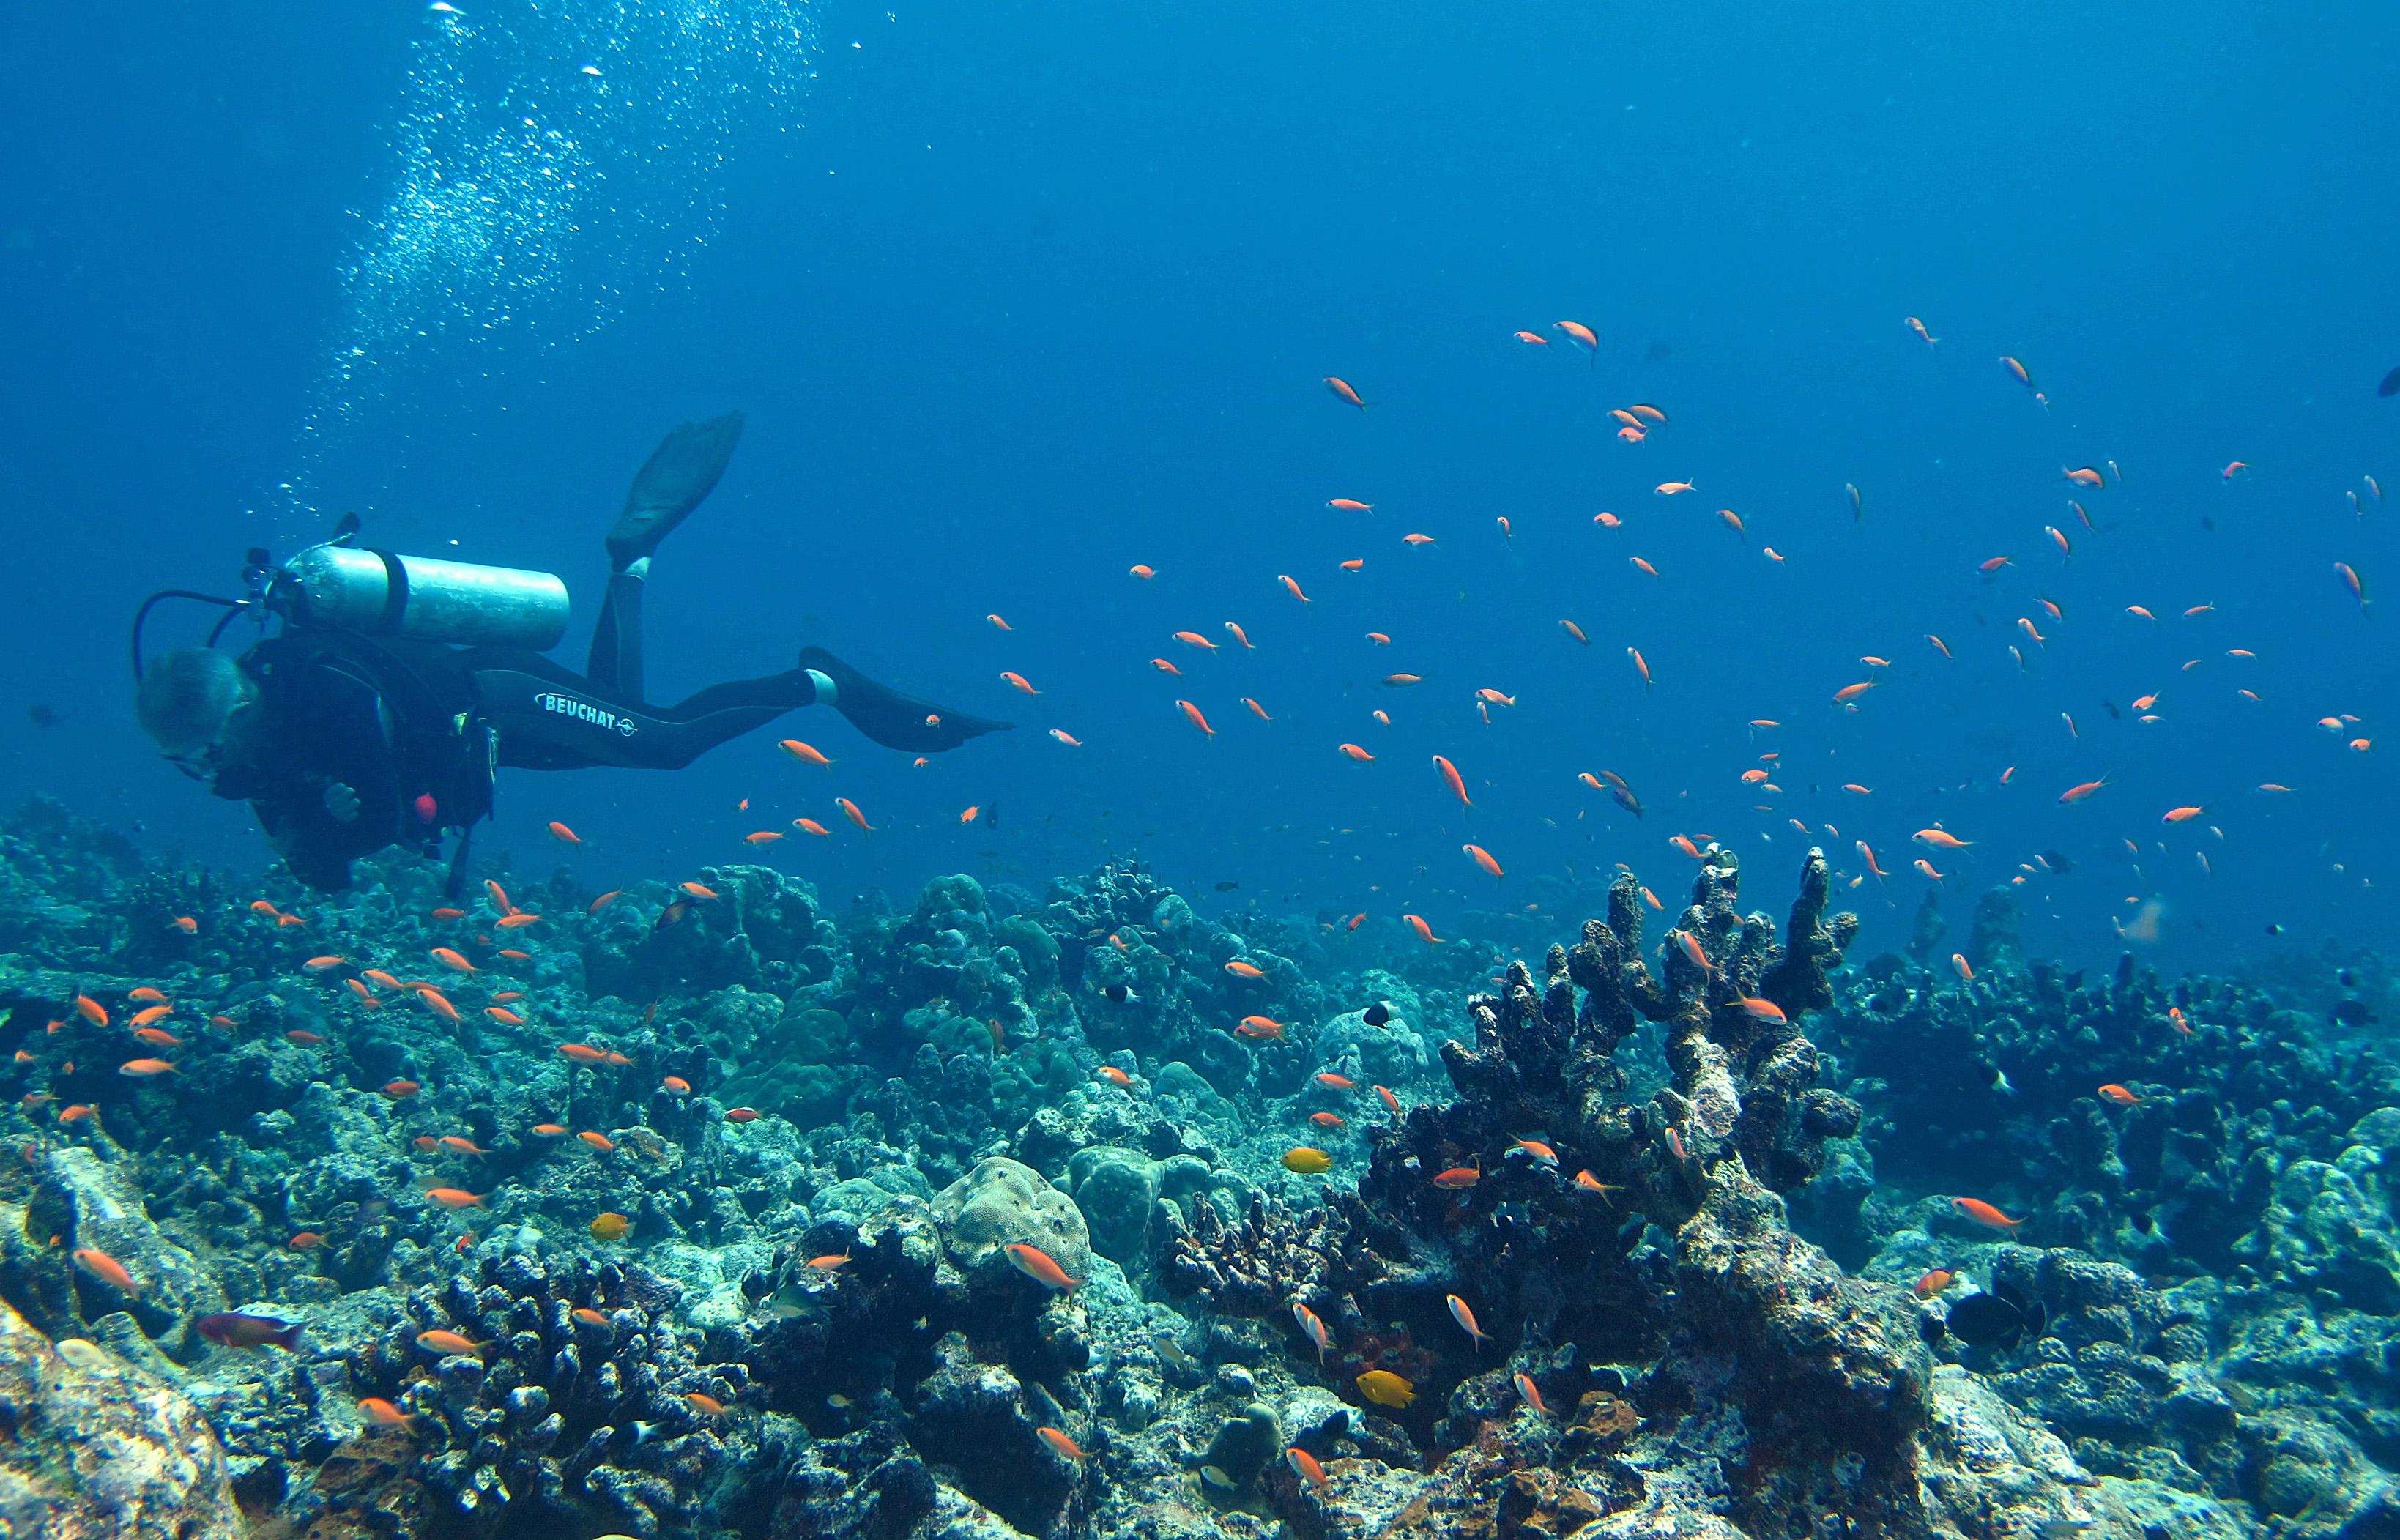 breathing underwater, scuba diver